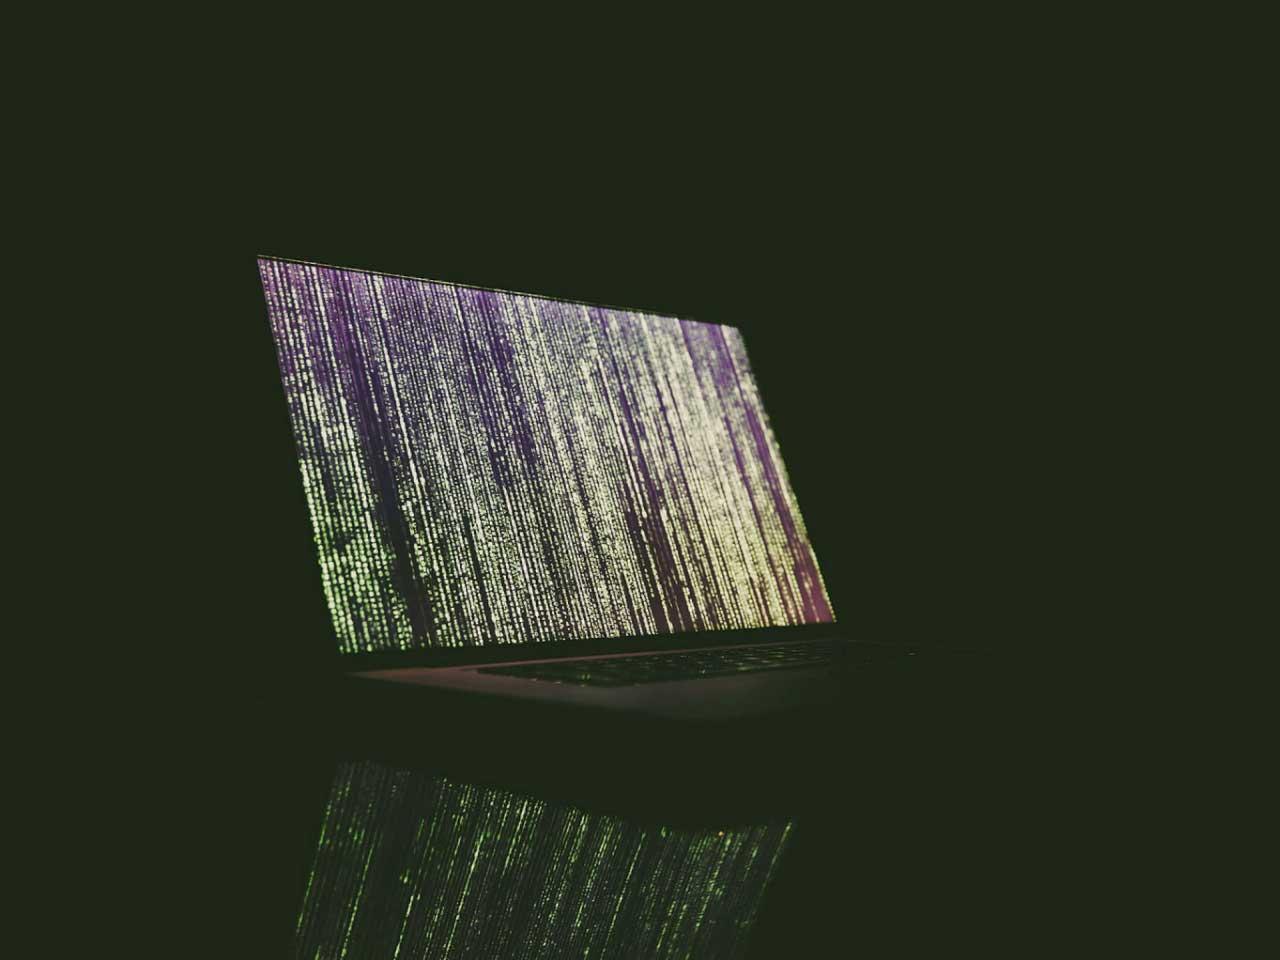 DGC-Cybertinsights-Datendiebstahl